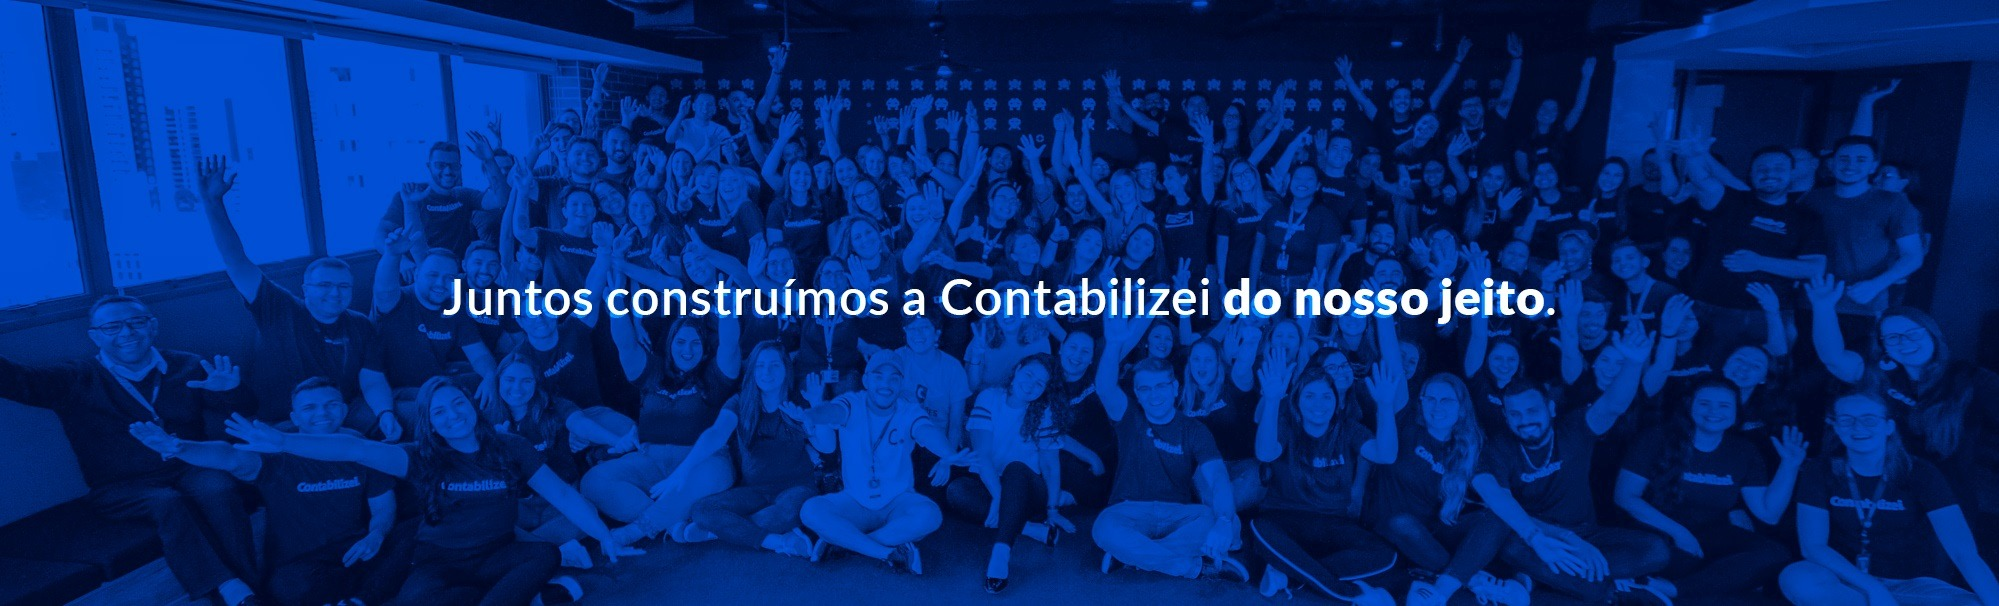 Analista Contábil Pleno/Sênior | Curitiba